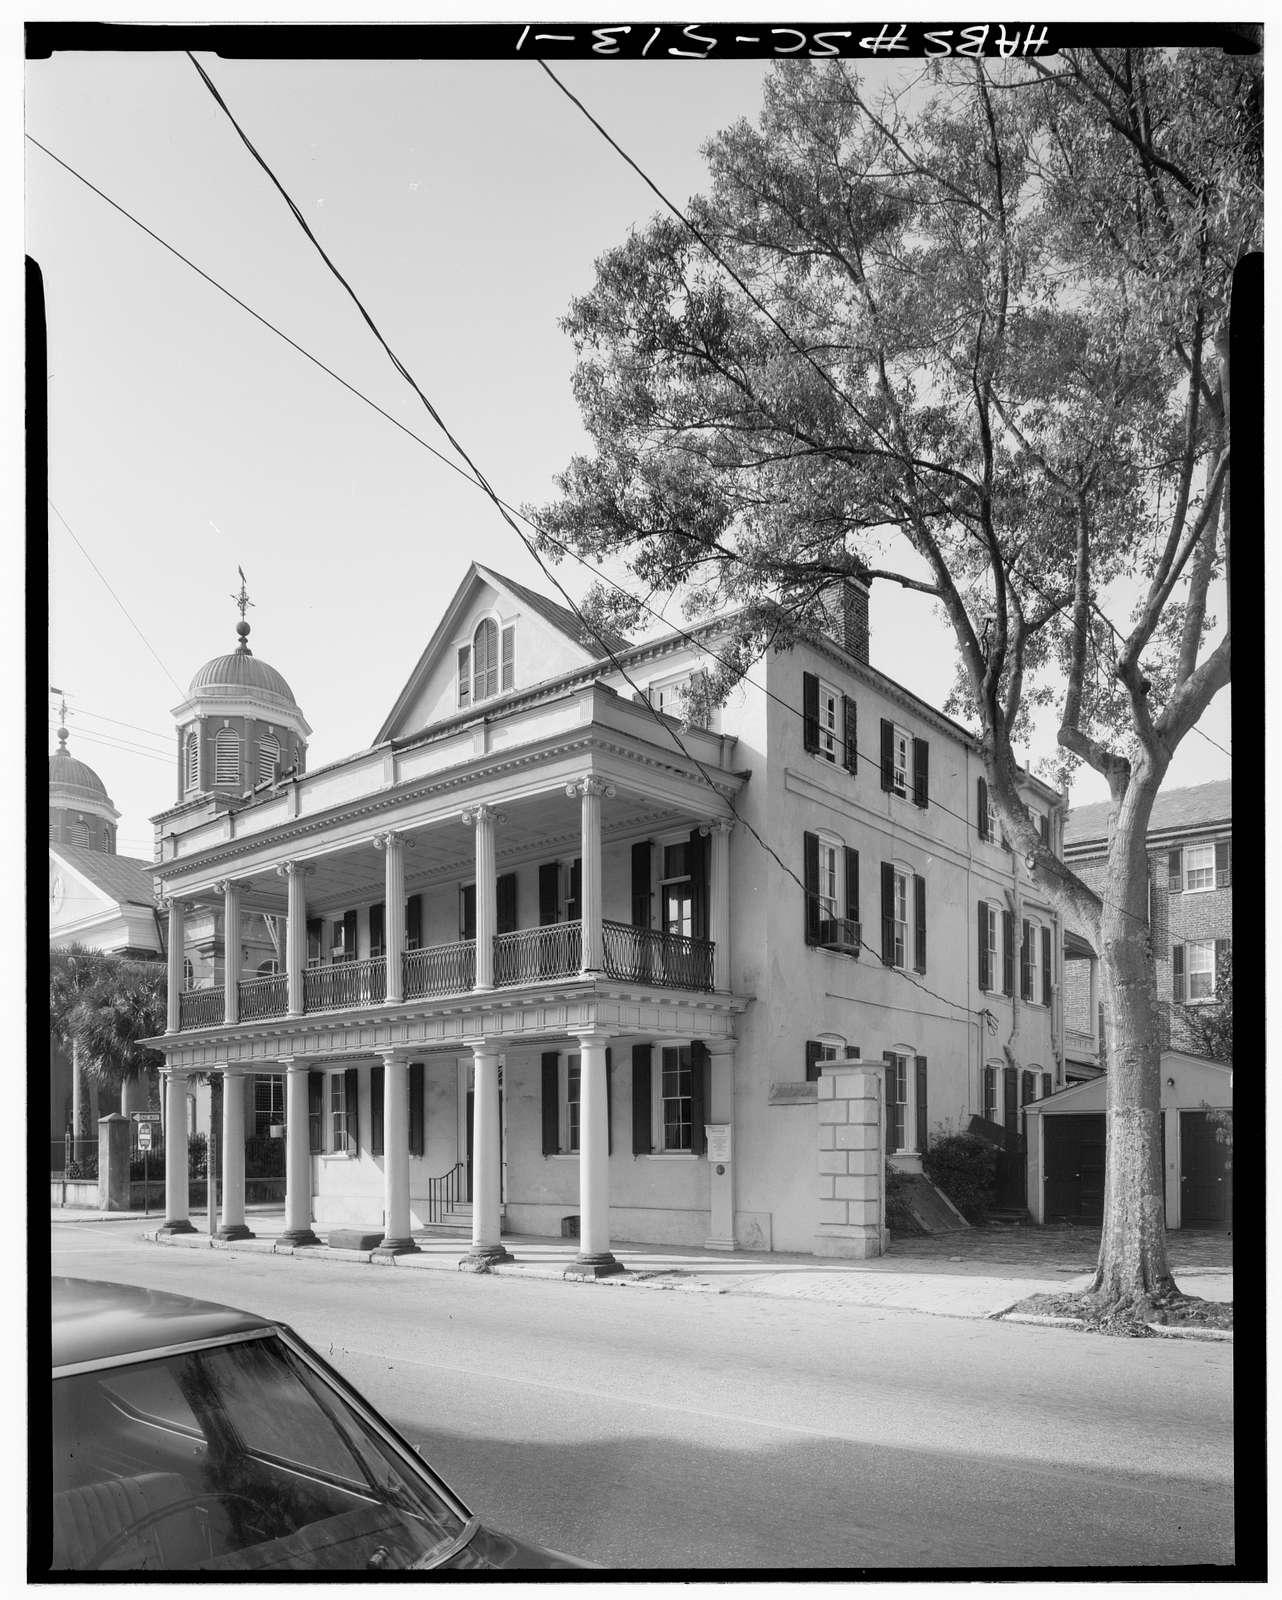 Branford-Horry House, 59 Meeting Street, Charleston, Charleston County, SC